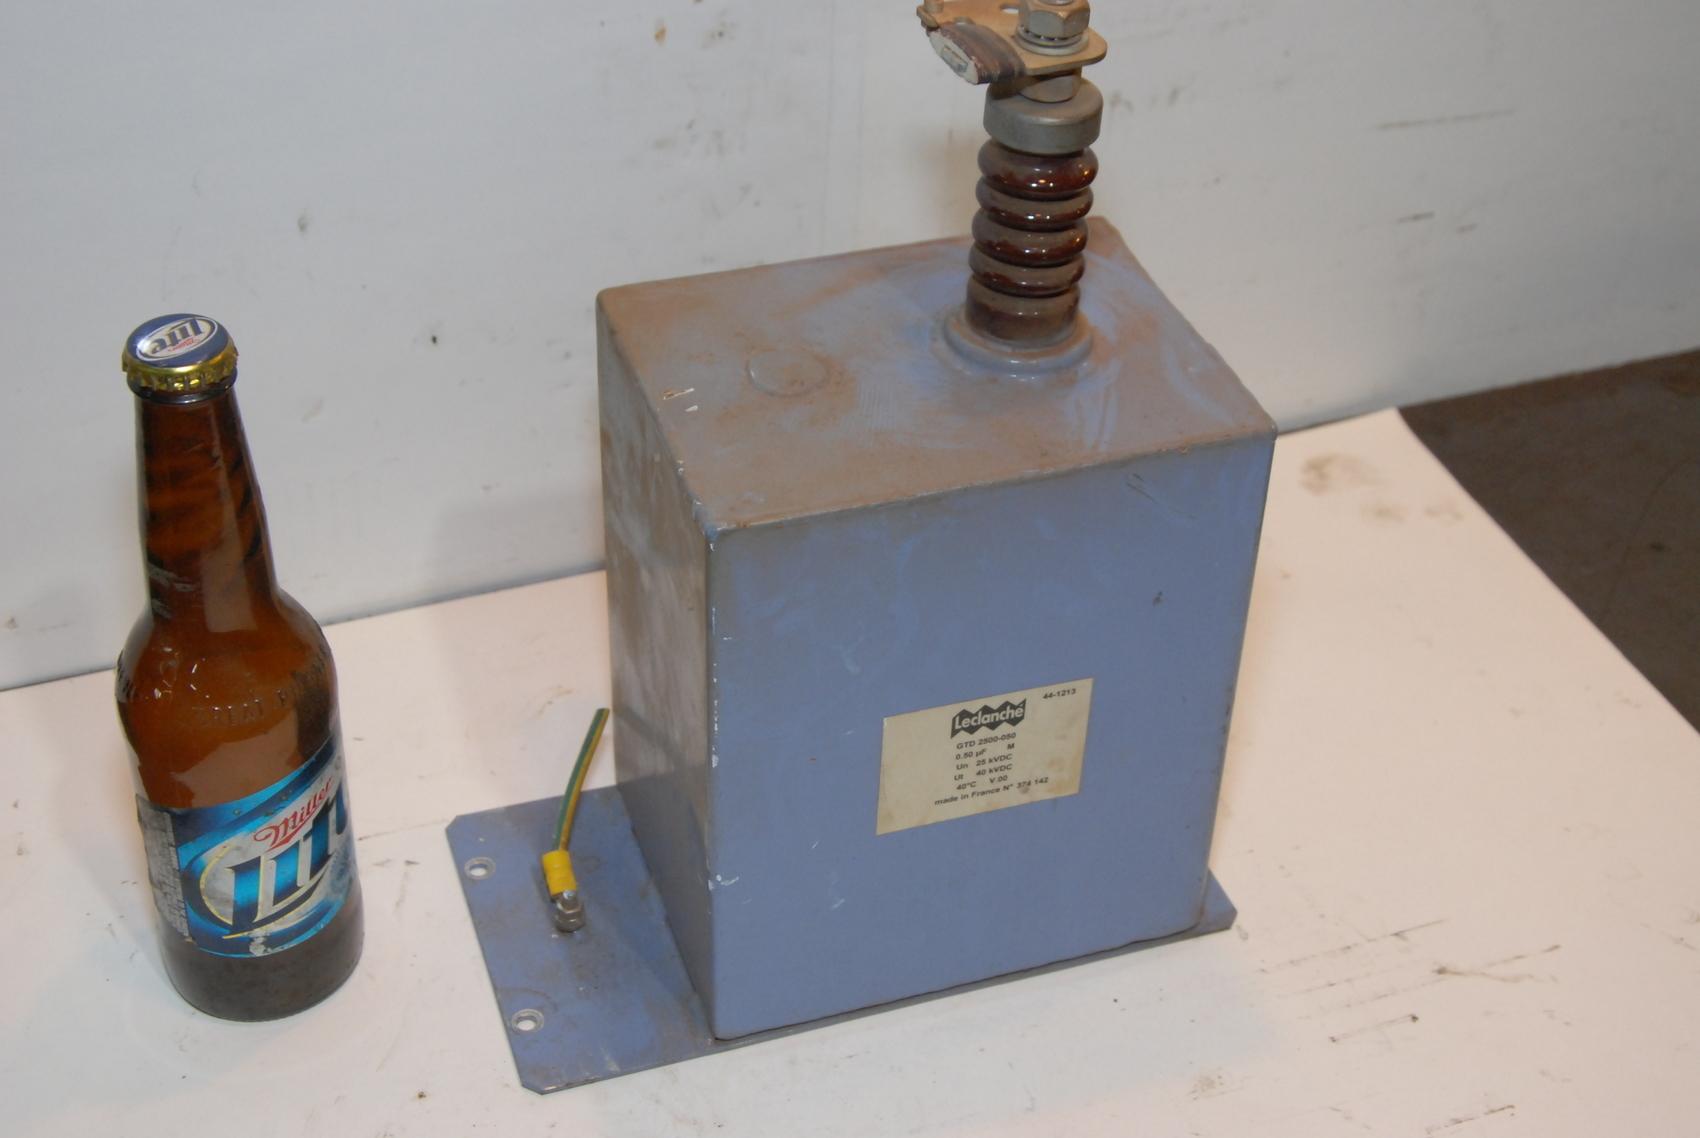 high voltage CapaCitor LECLANCHE GTD2500-050 25kV 0.5uF kvdc